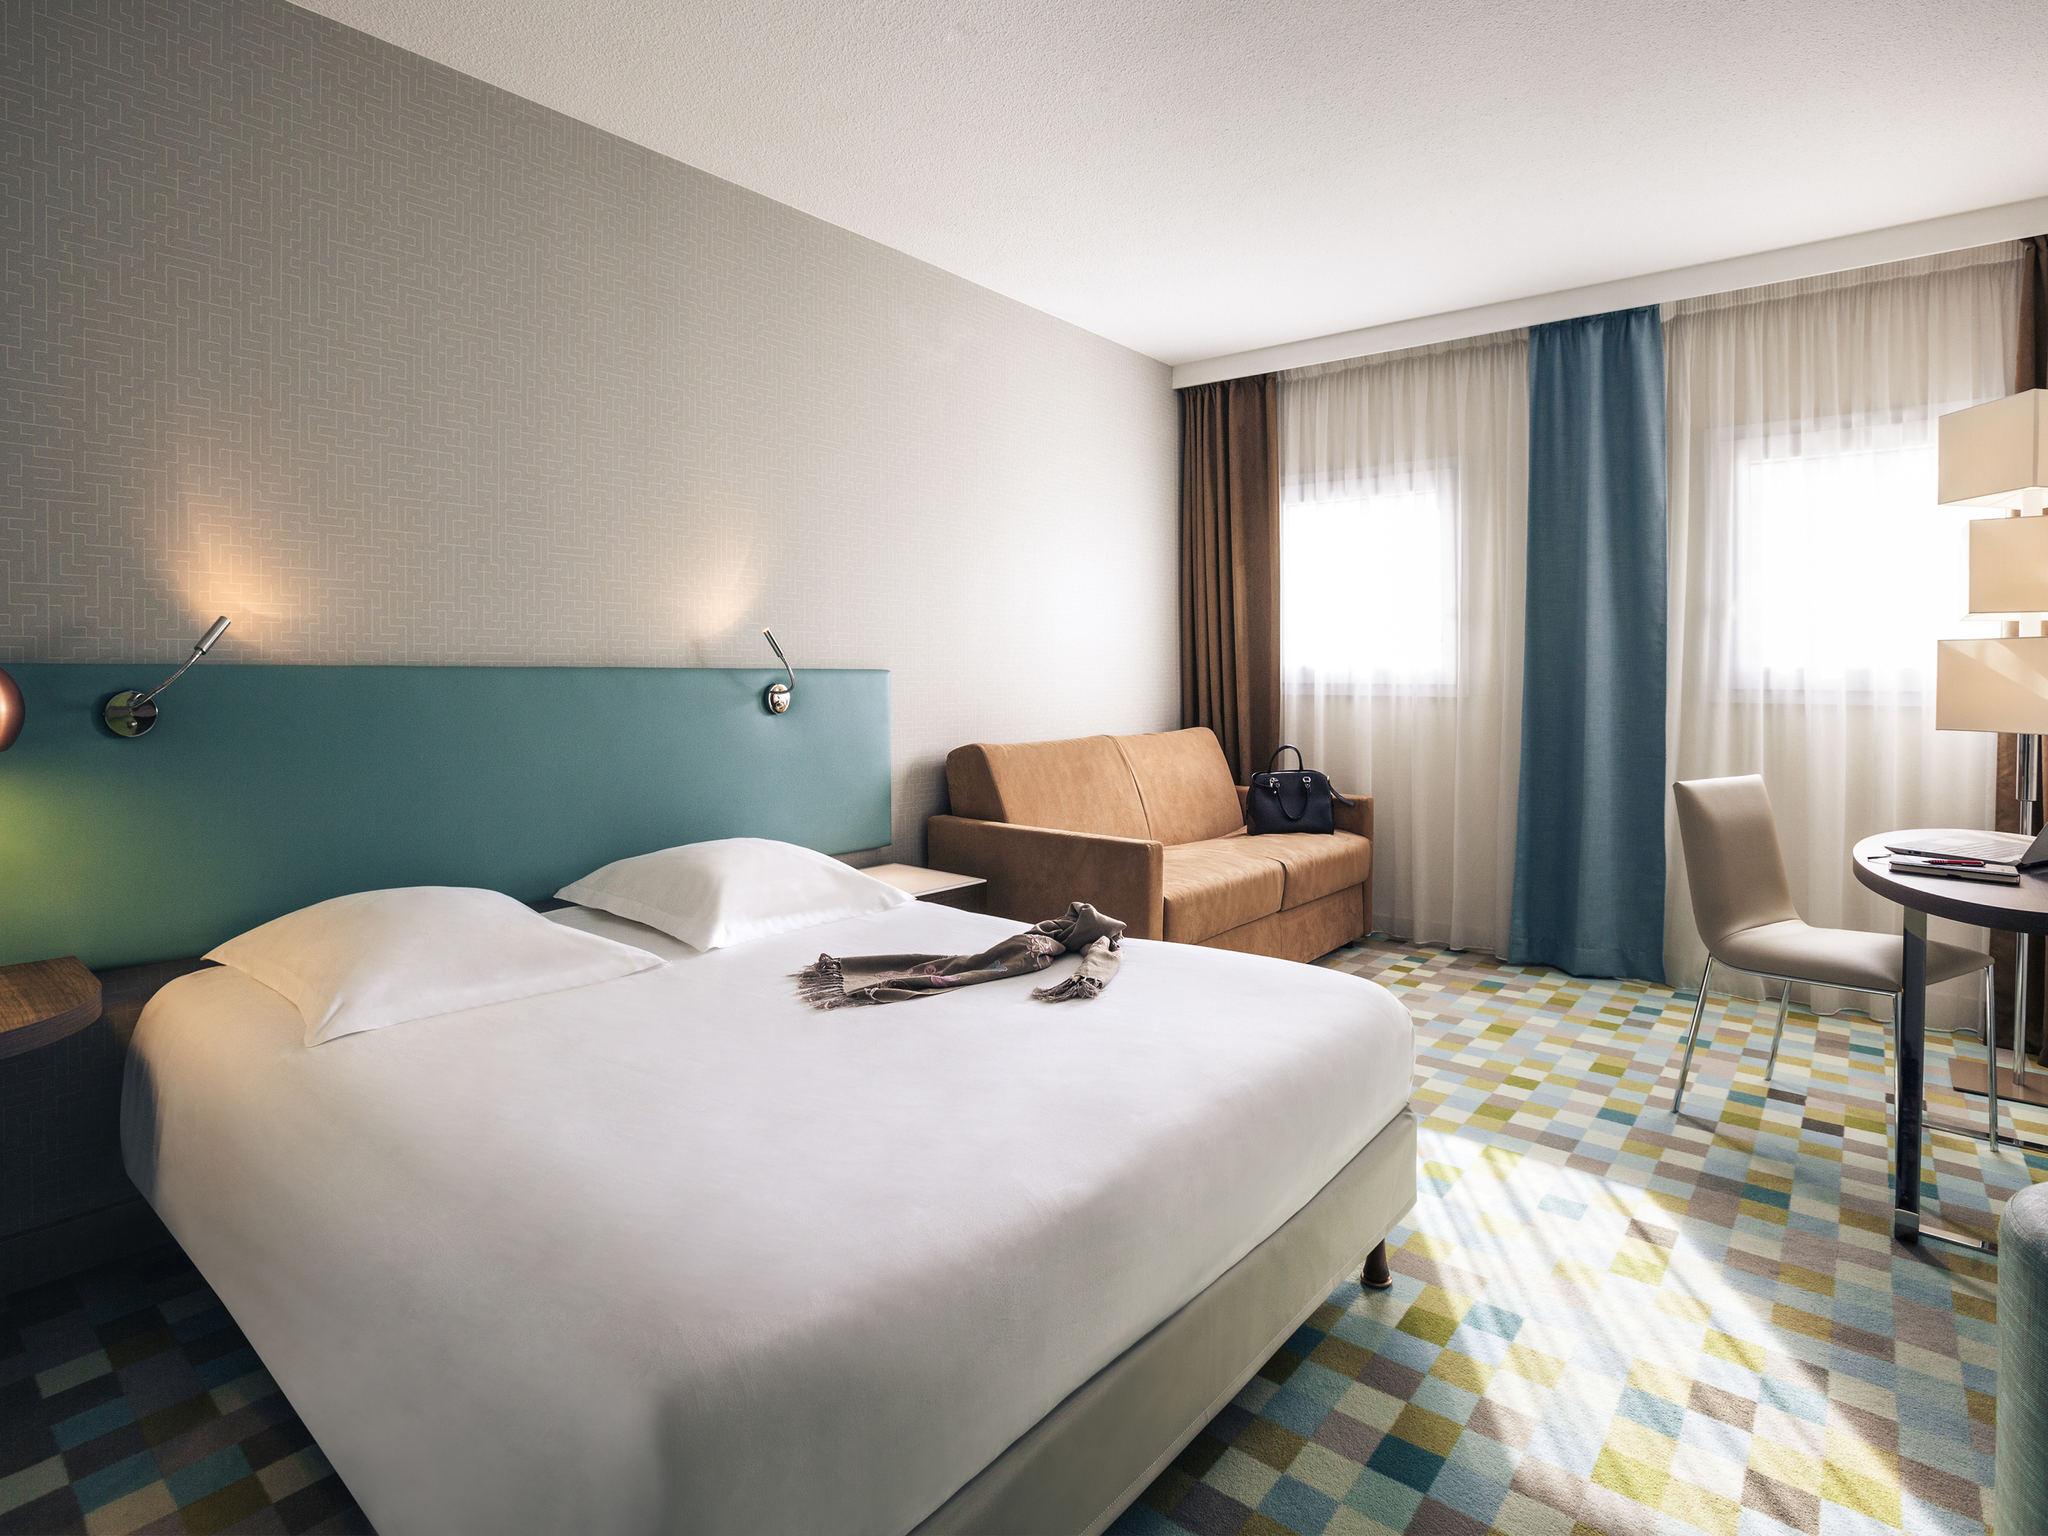 ホテル – Hôtel Mercure Marne-la-Vallée Bussy-Saint-Georges